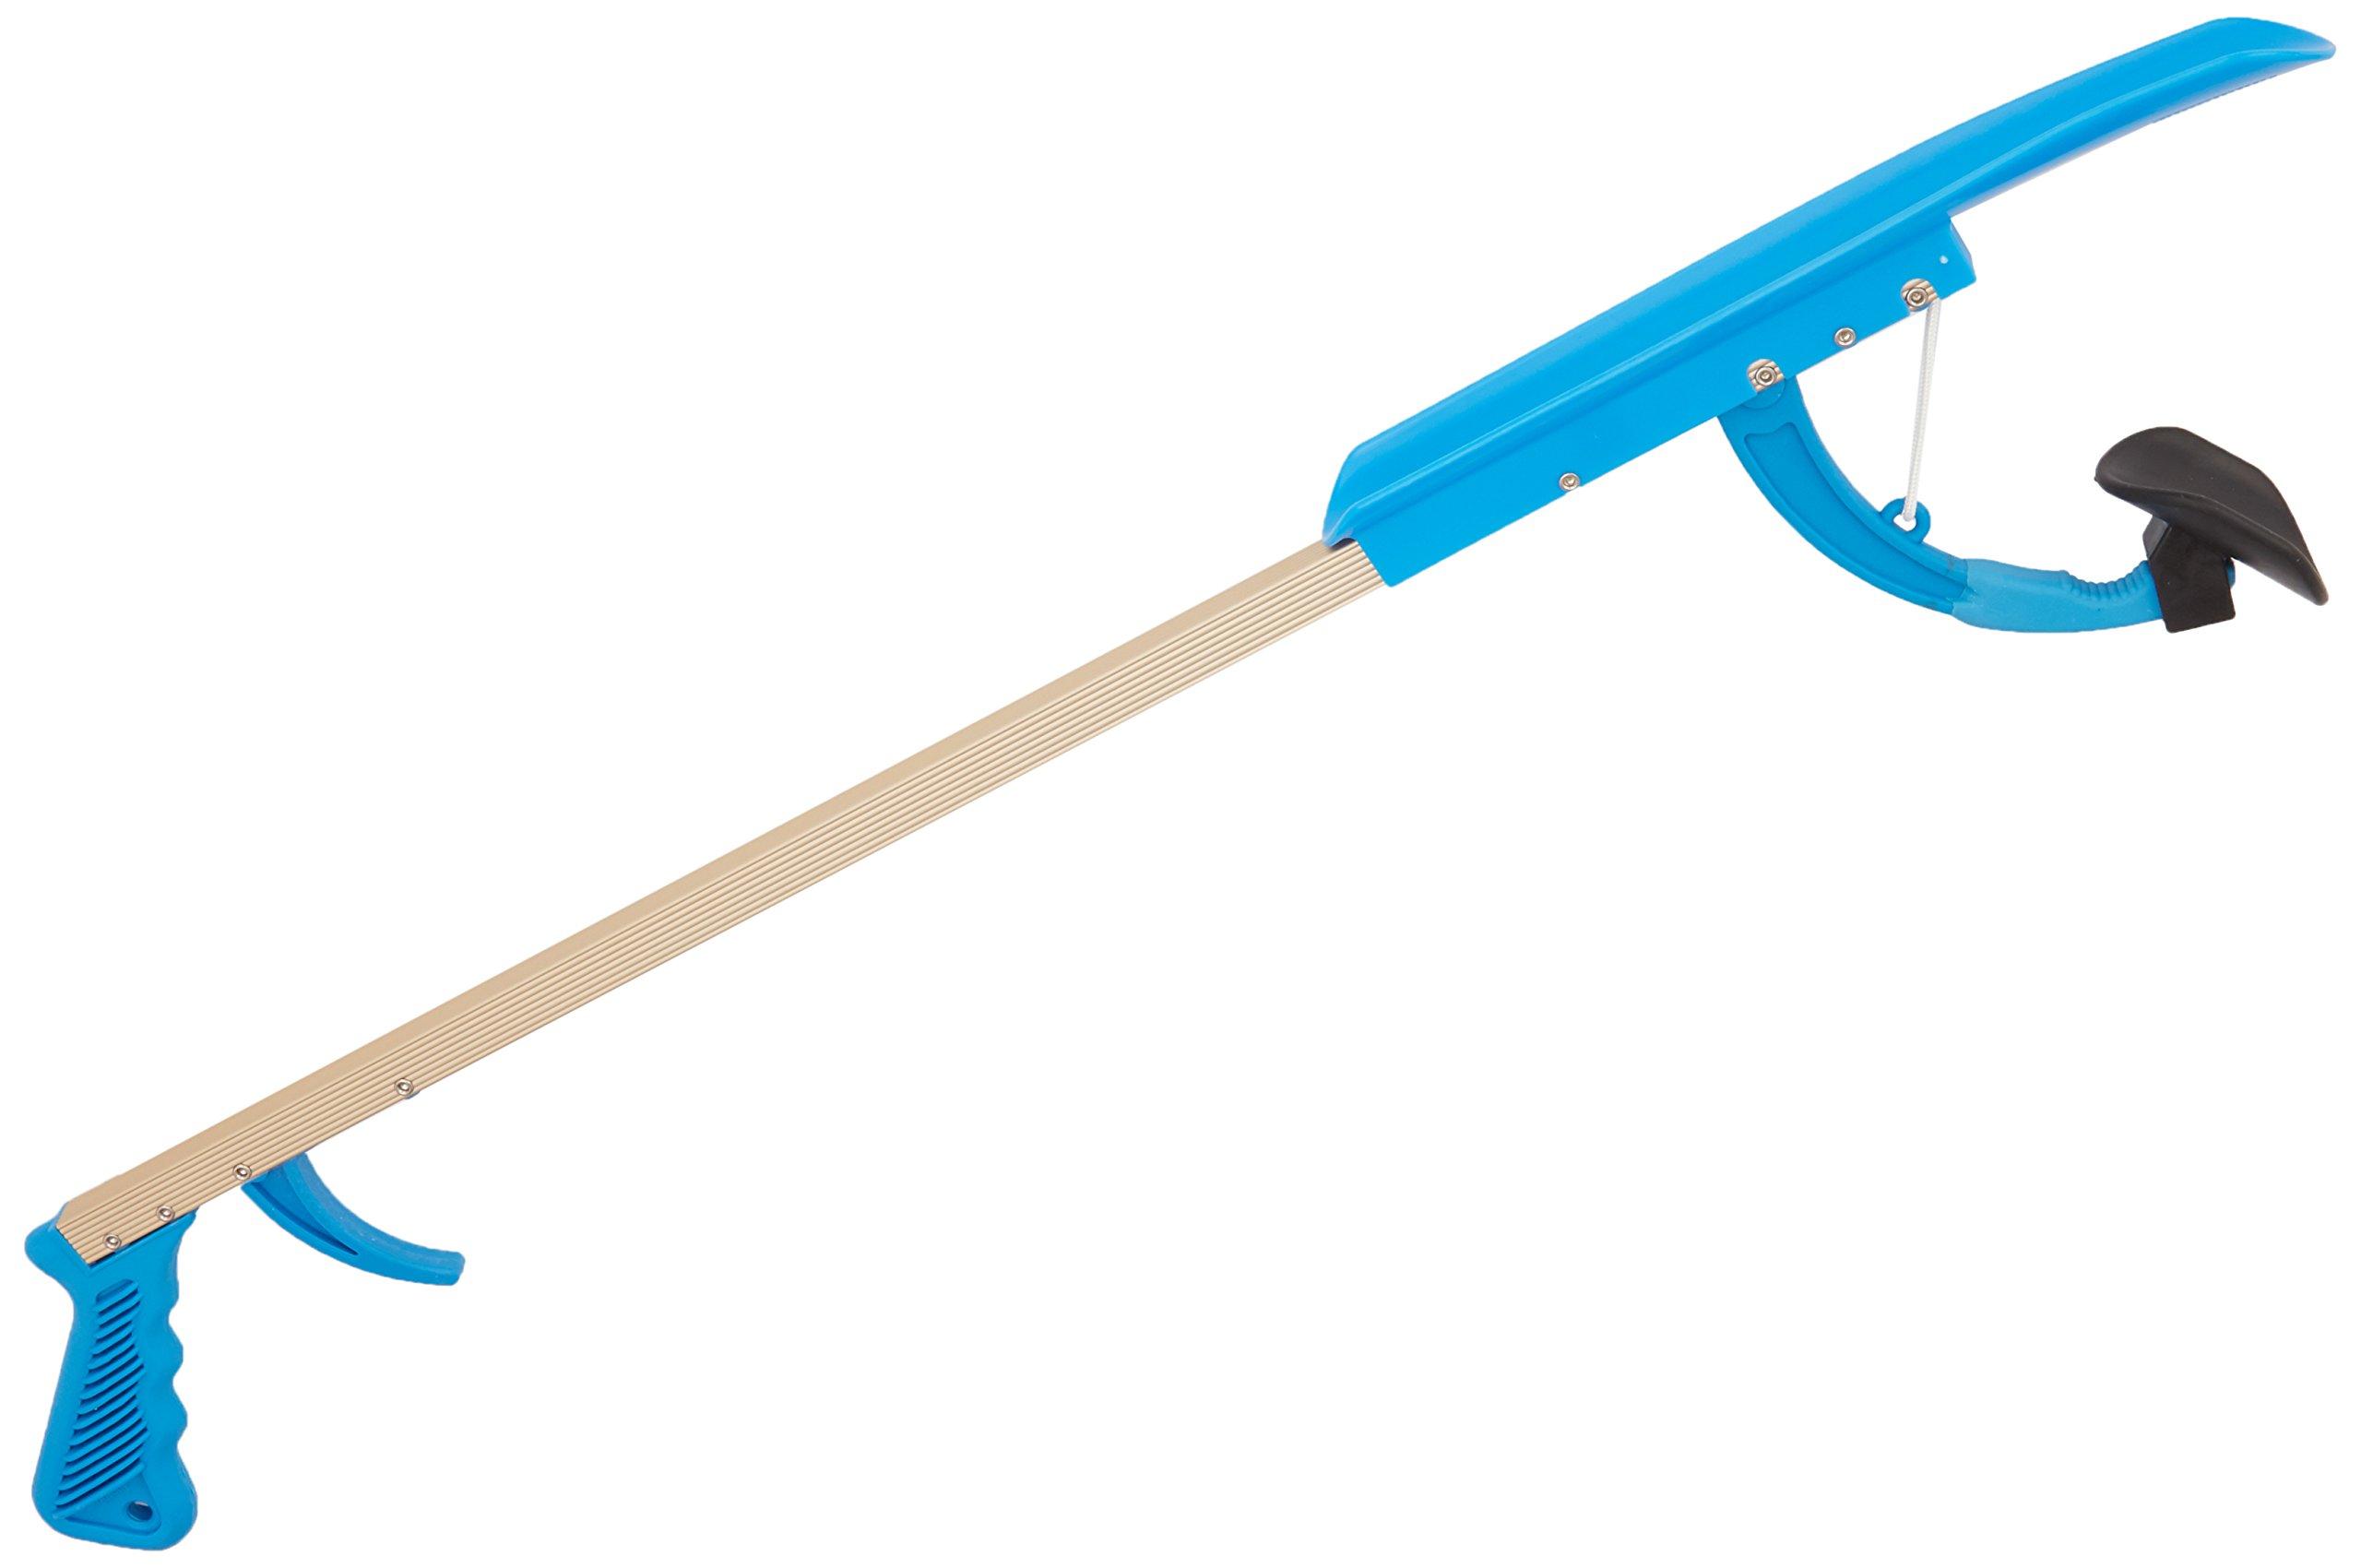 Sammons Preston 26'' Shoe Horn Reacher, Lightweight Extended Reacher Grabber for Picking Up Objects, Reaching & Grabbing Tool for Elderly & Limited Mobility, Shoehorn for Putting on Shoes